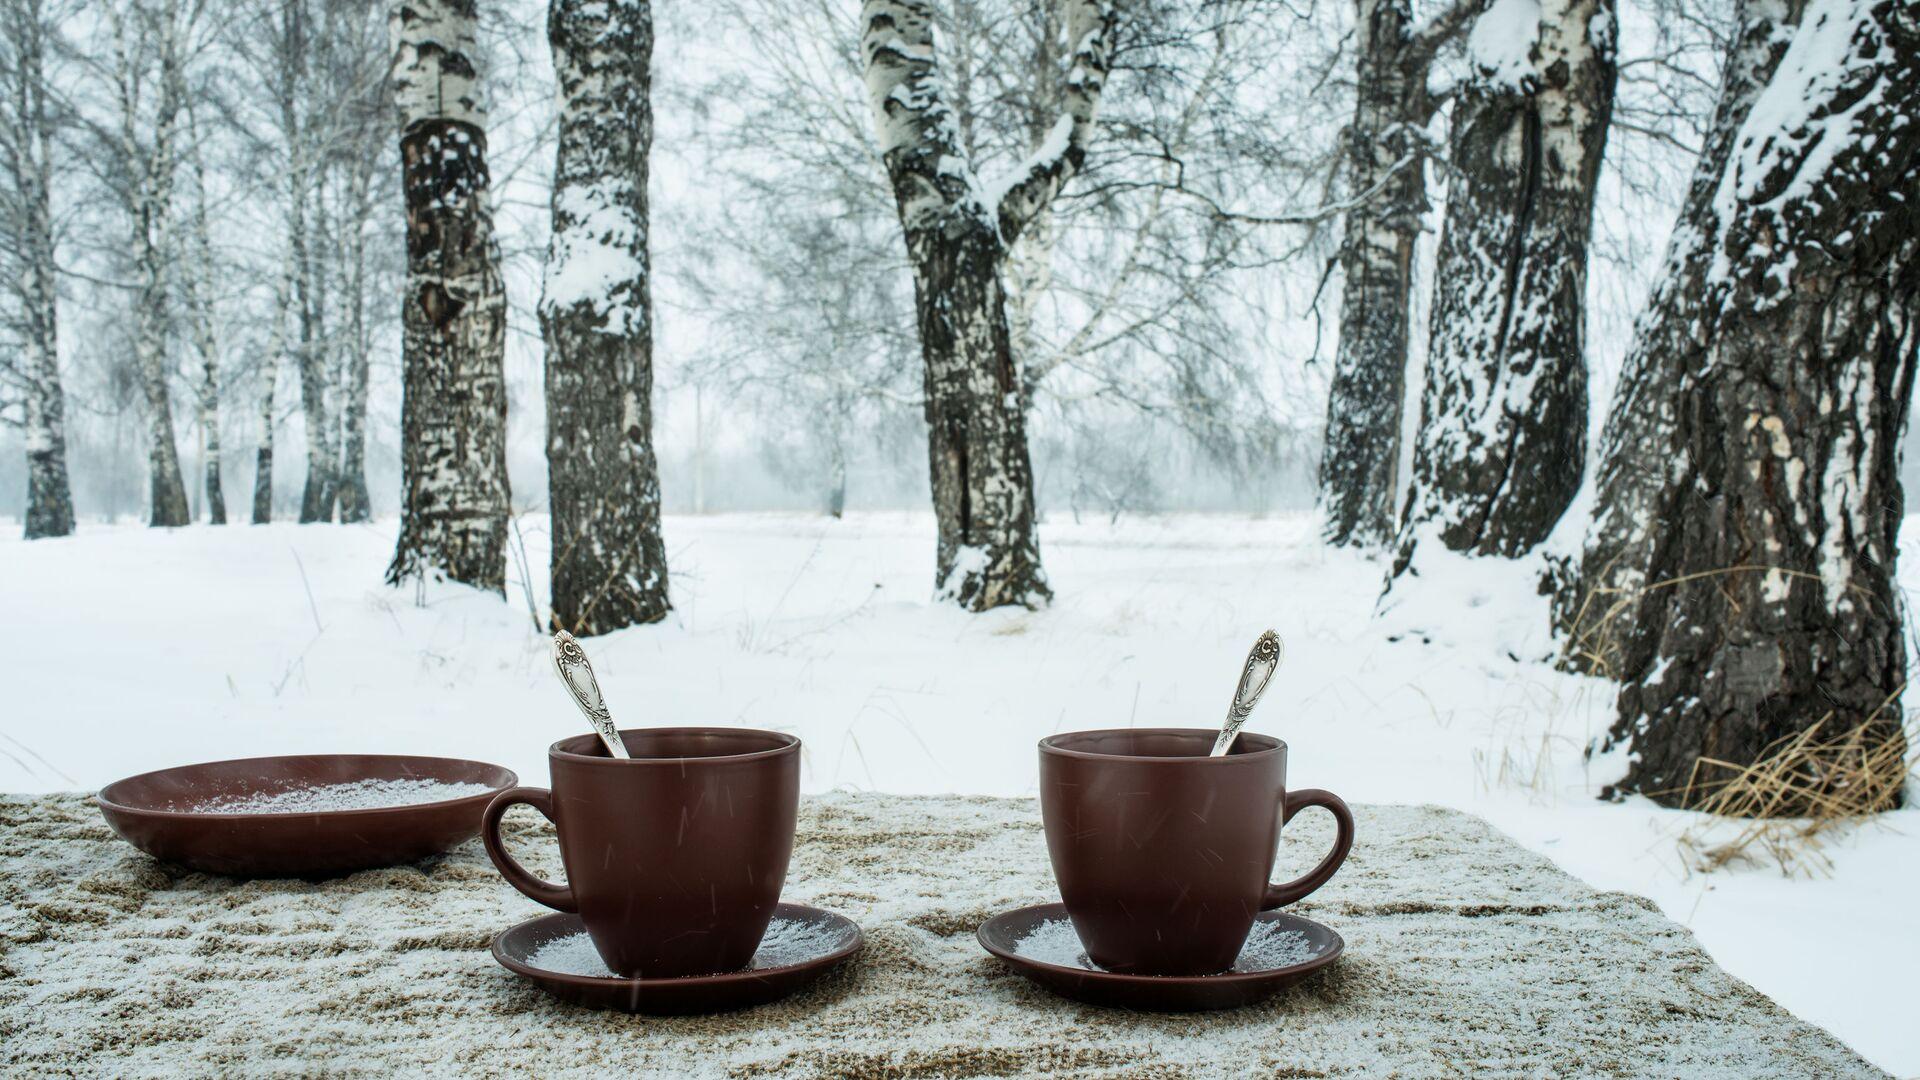 Две чашки на фоне зимнего пейзажа - РИА Новости, 1920, 20.11.2020